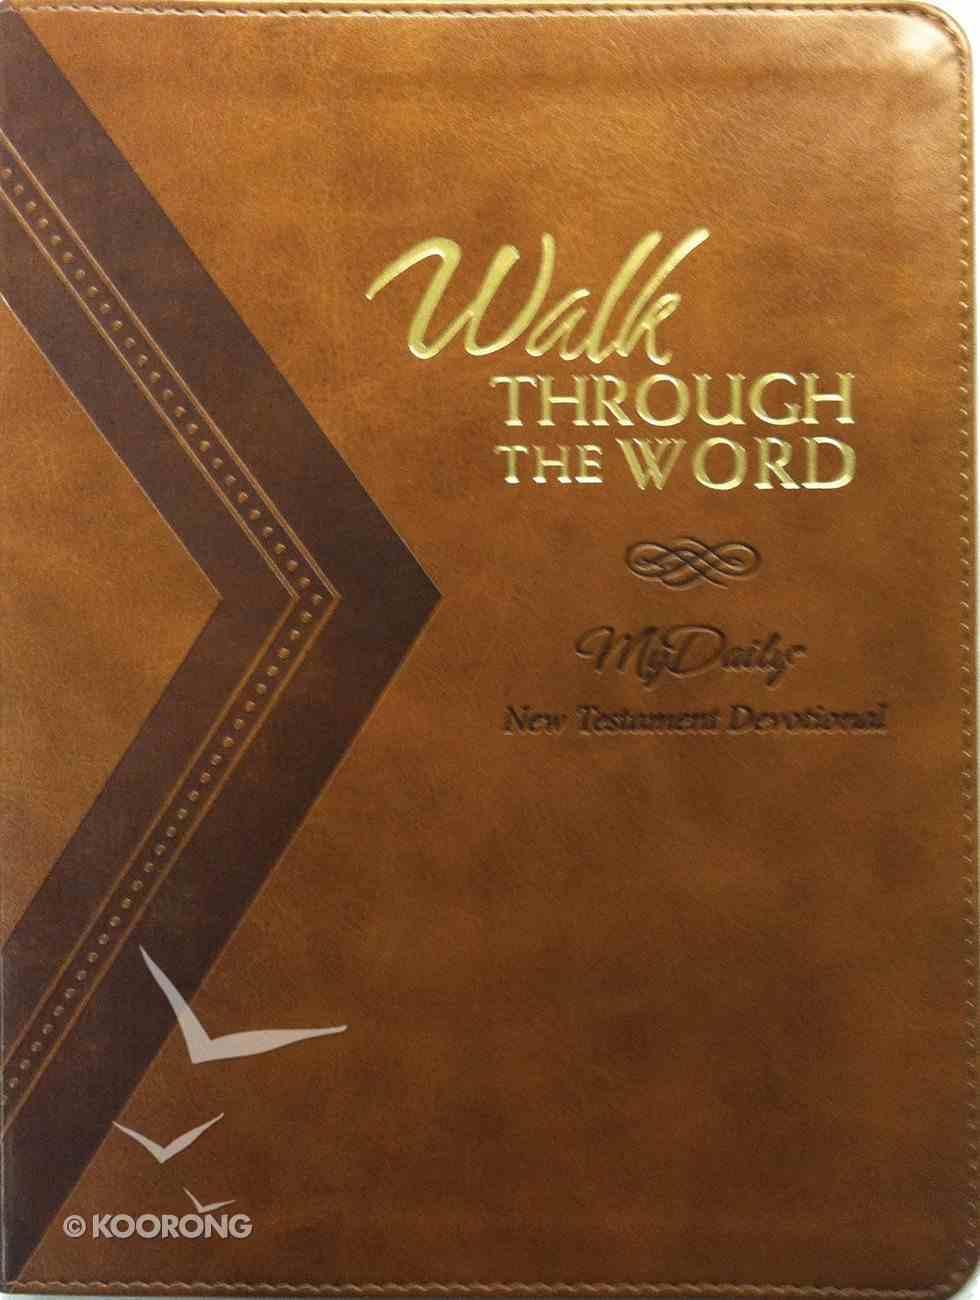 Walk Through the Word eBook